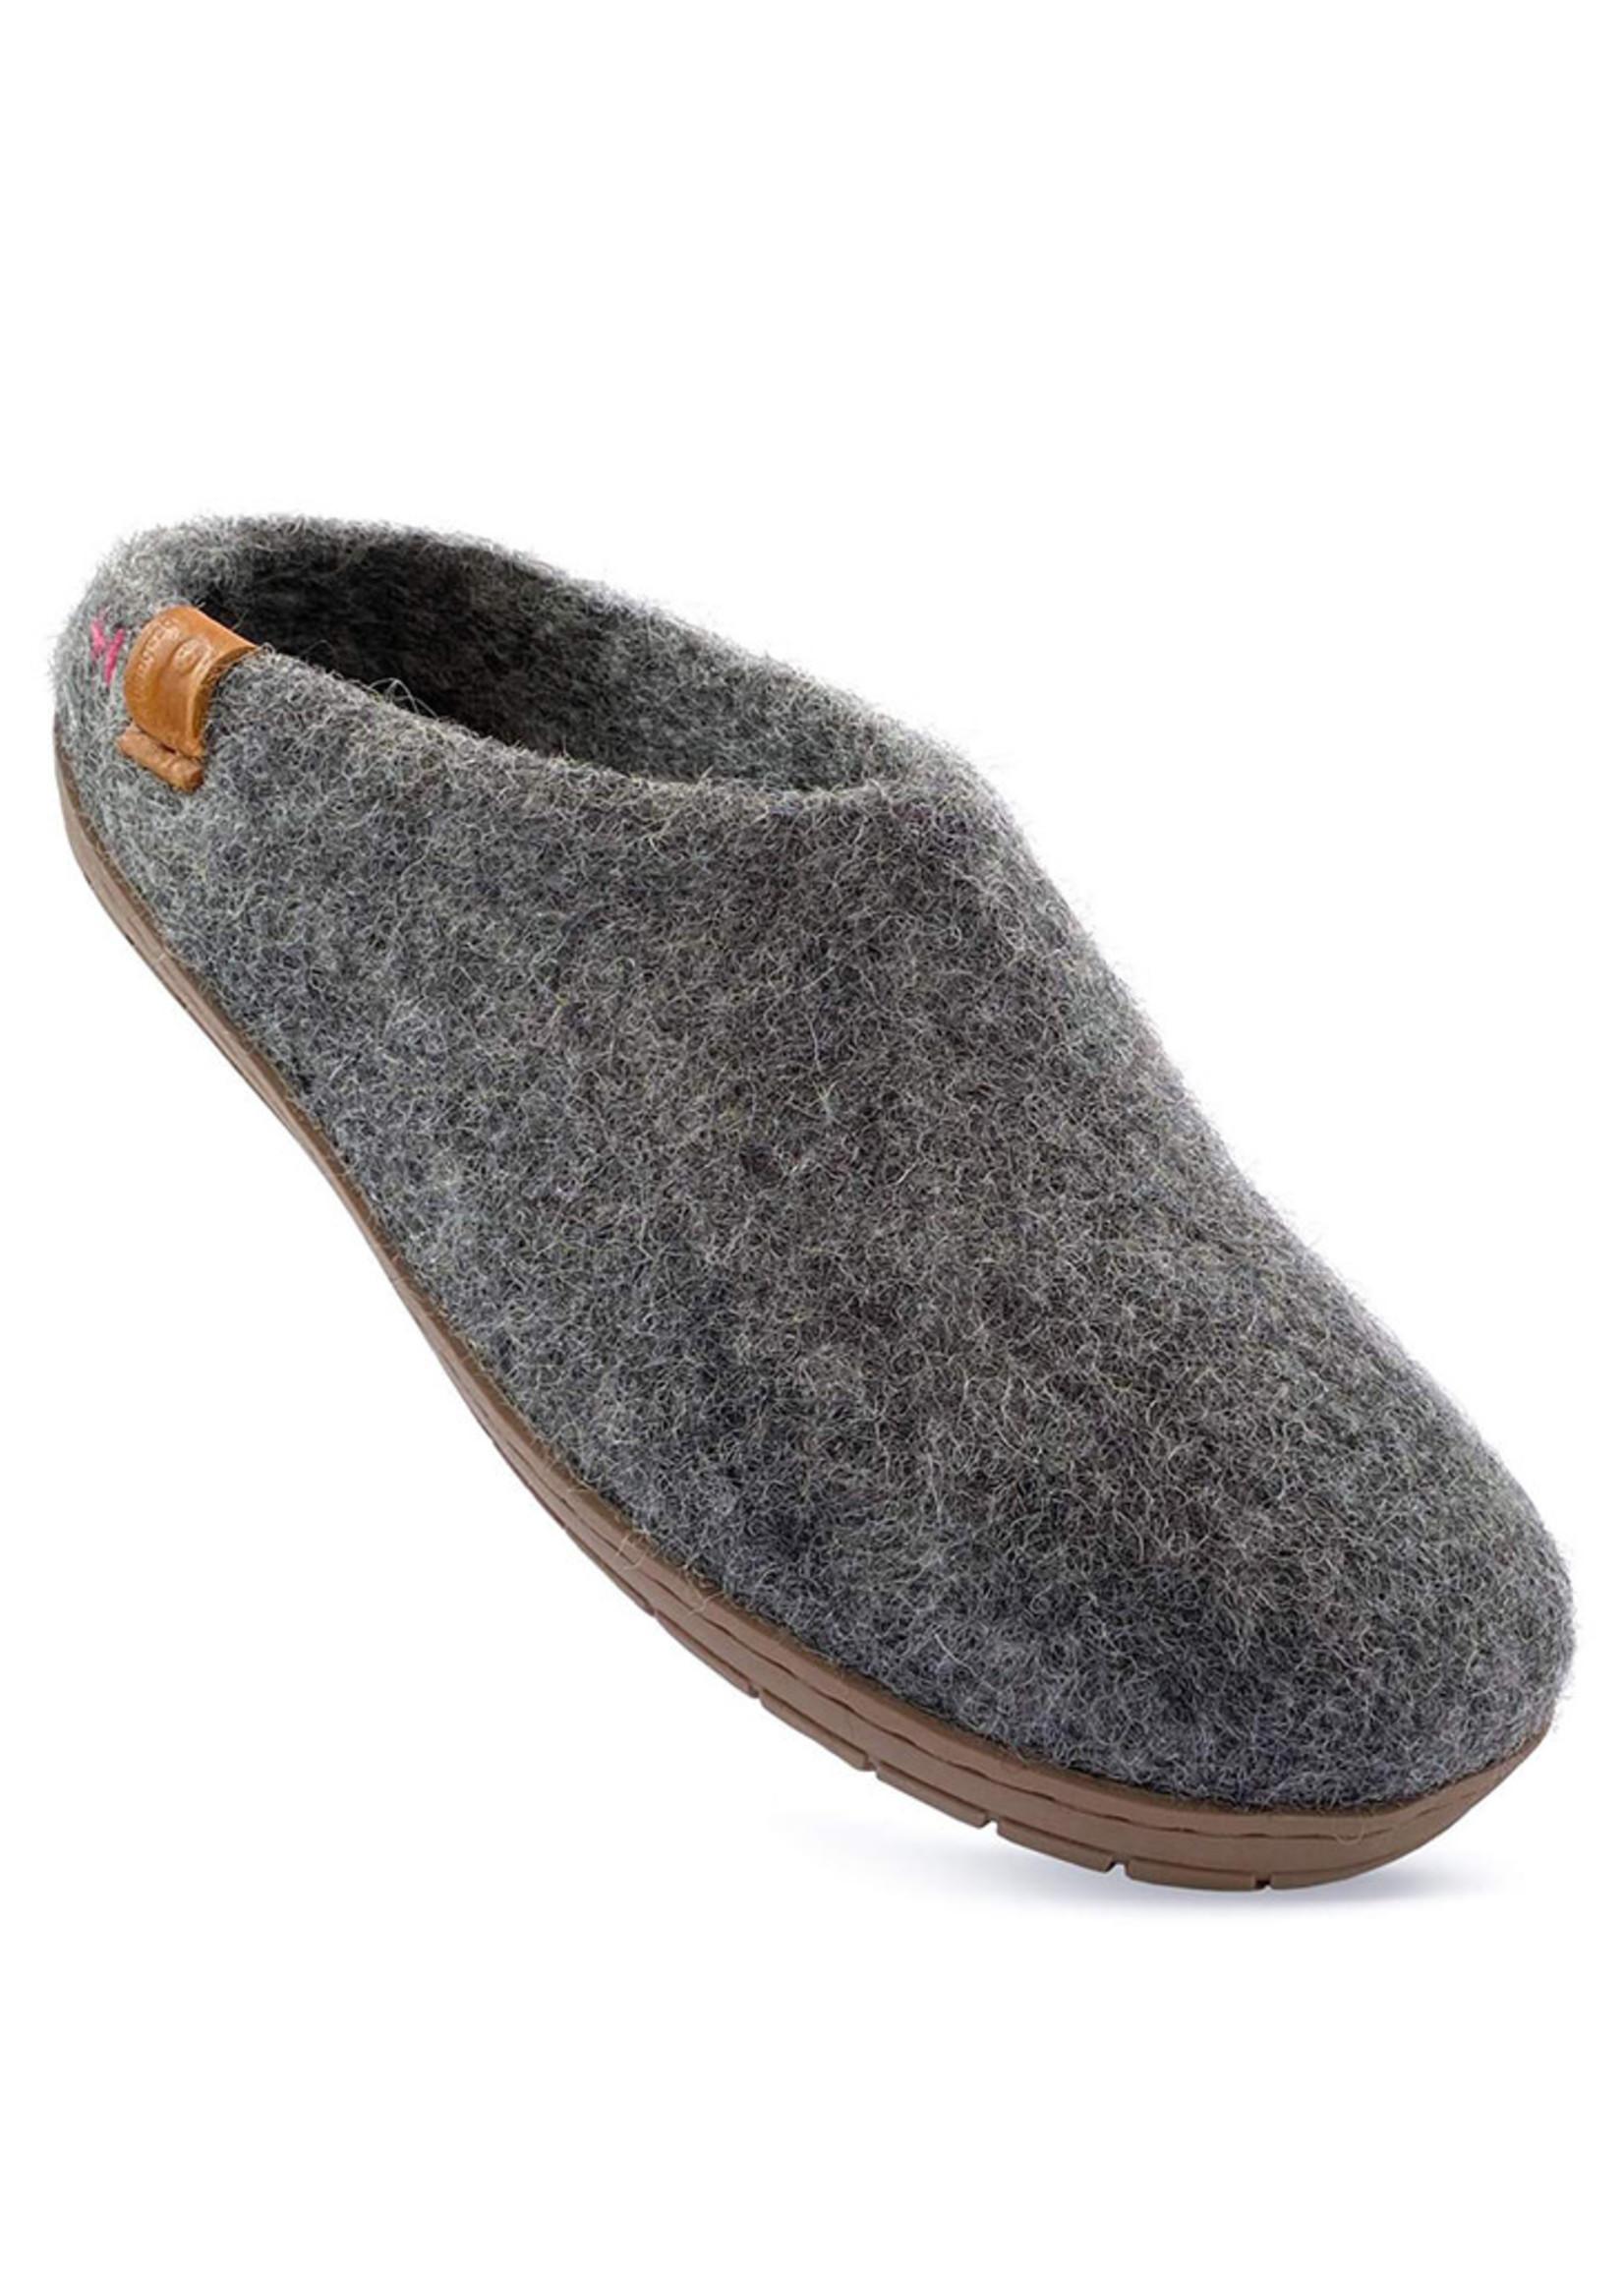 Baabushka Dark Grey Slipper Wool With Rubber Soles